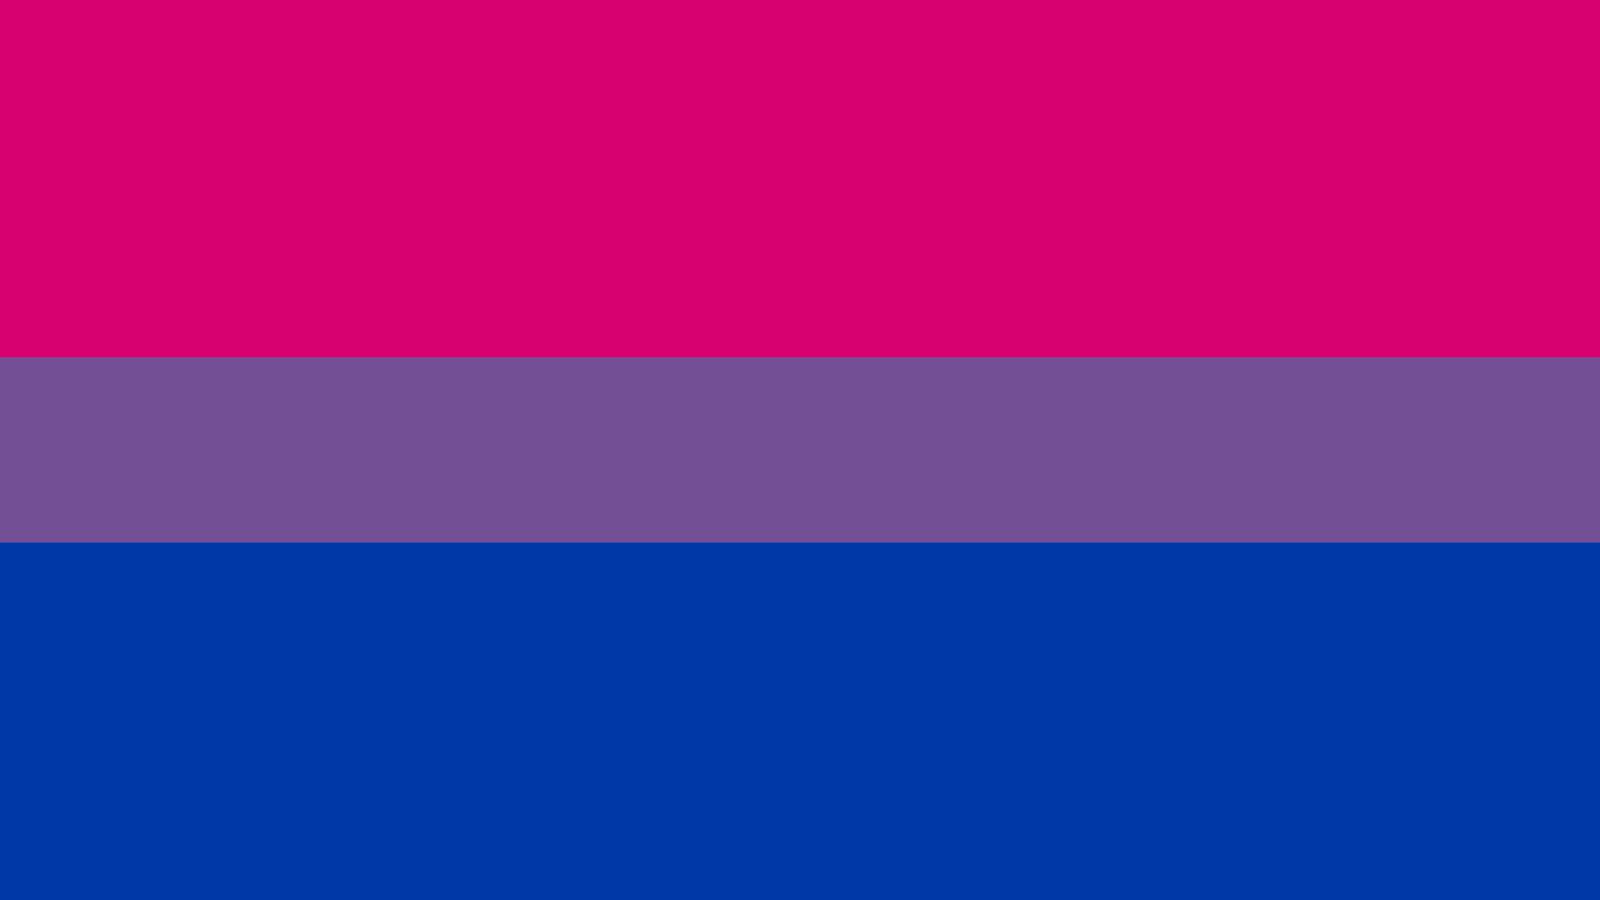 b flag